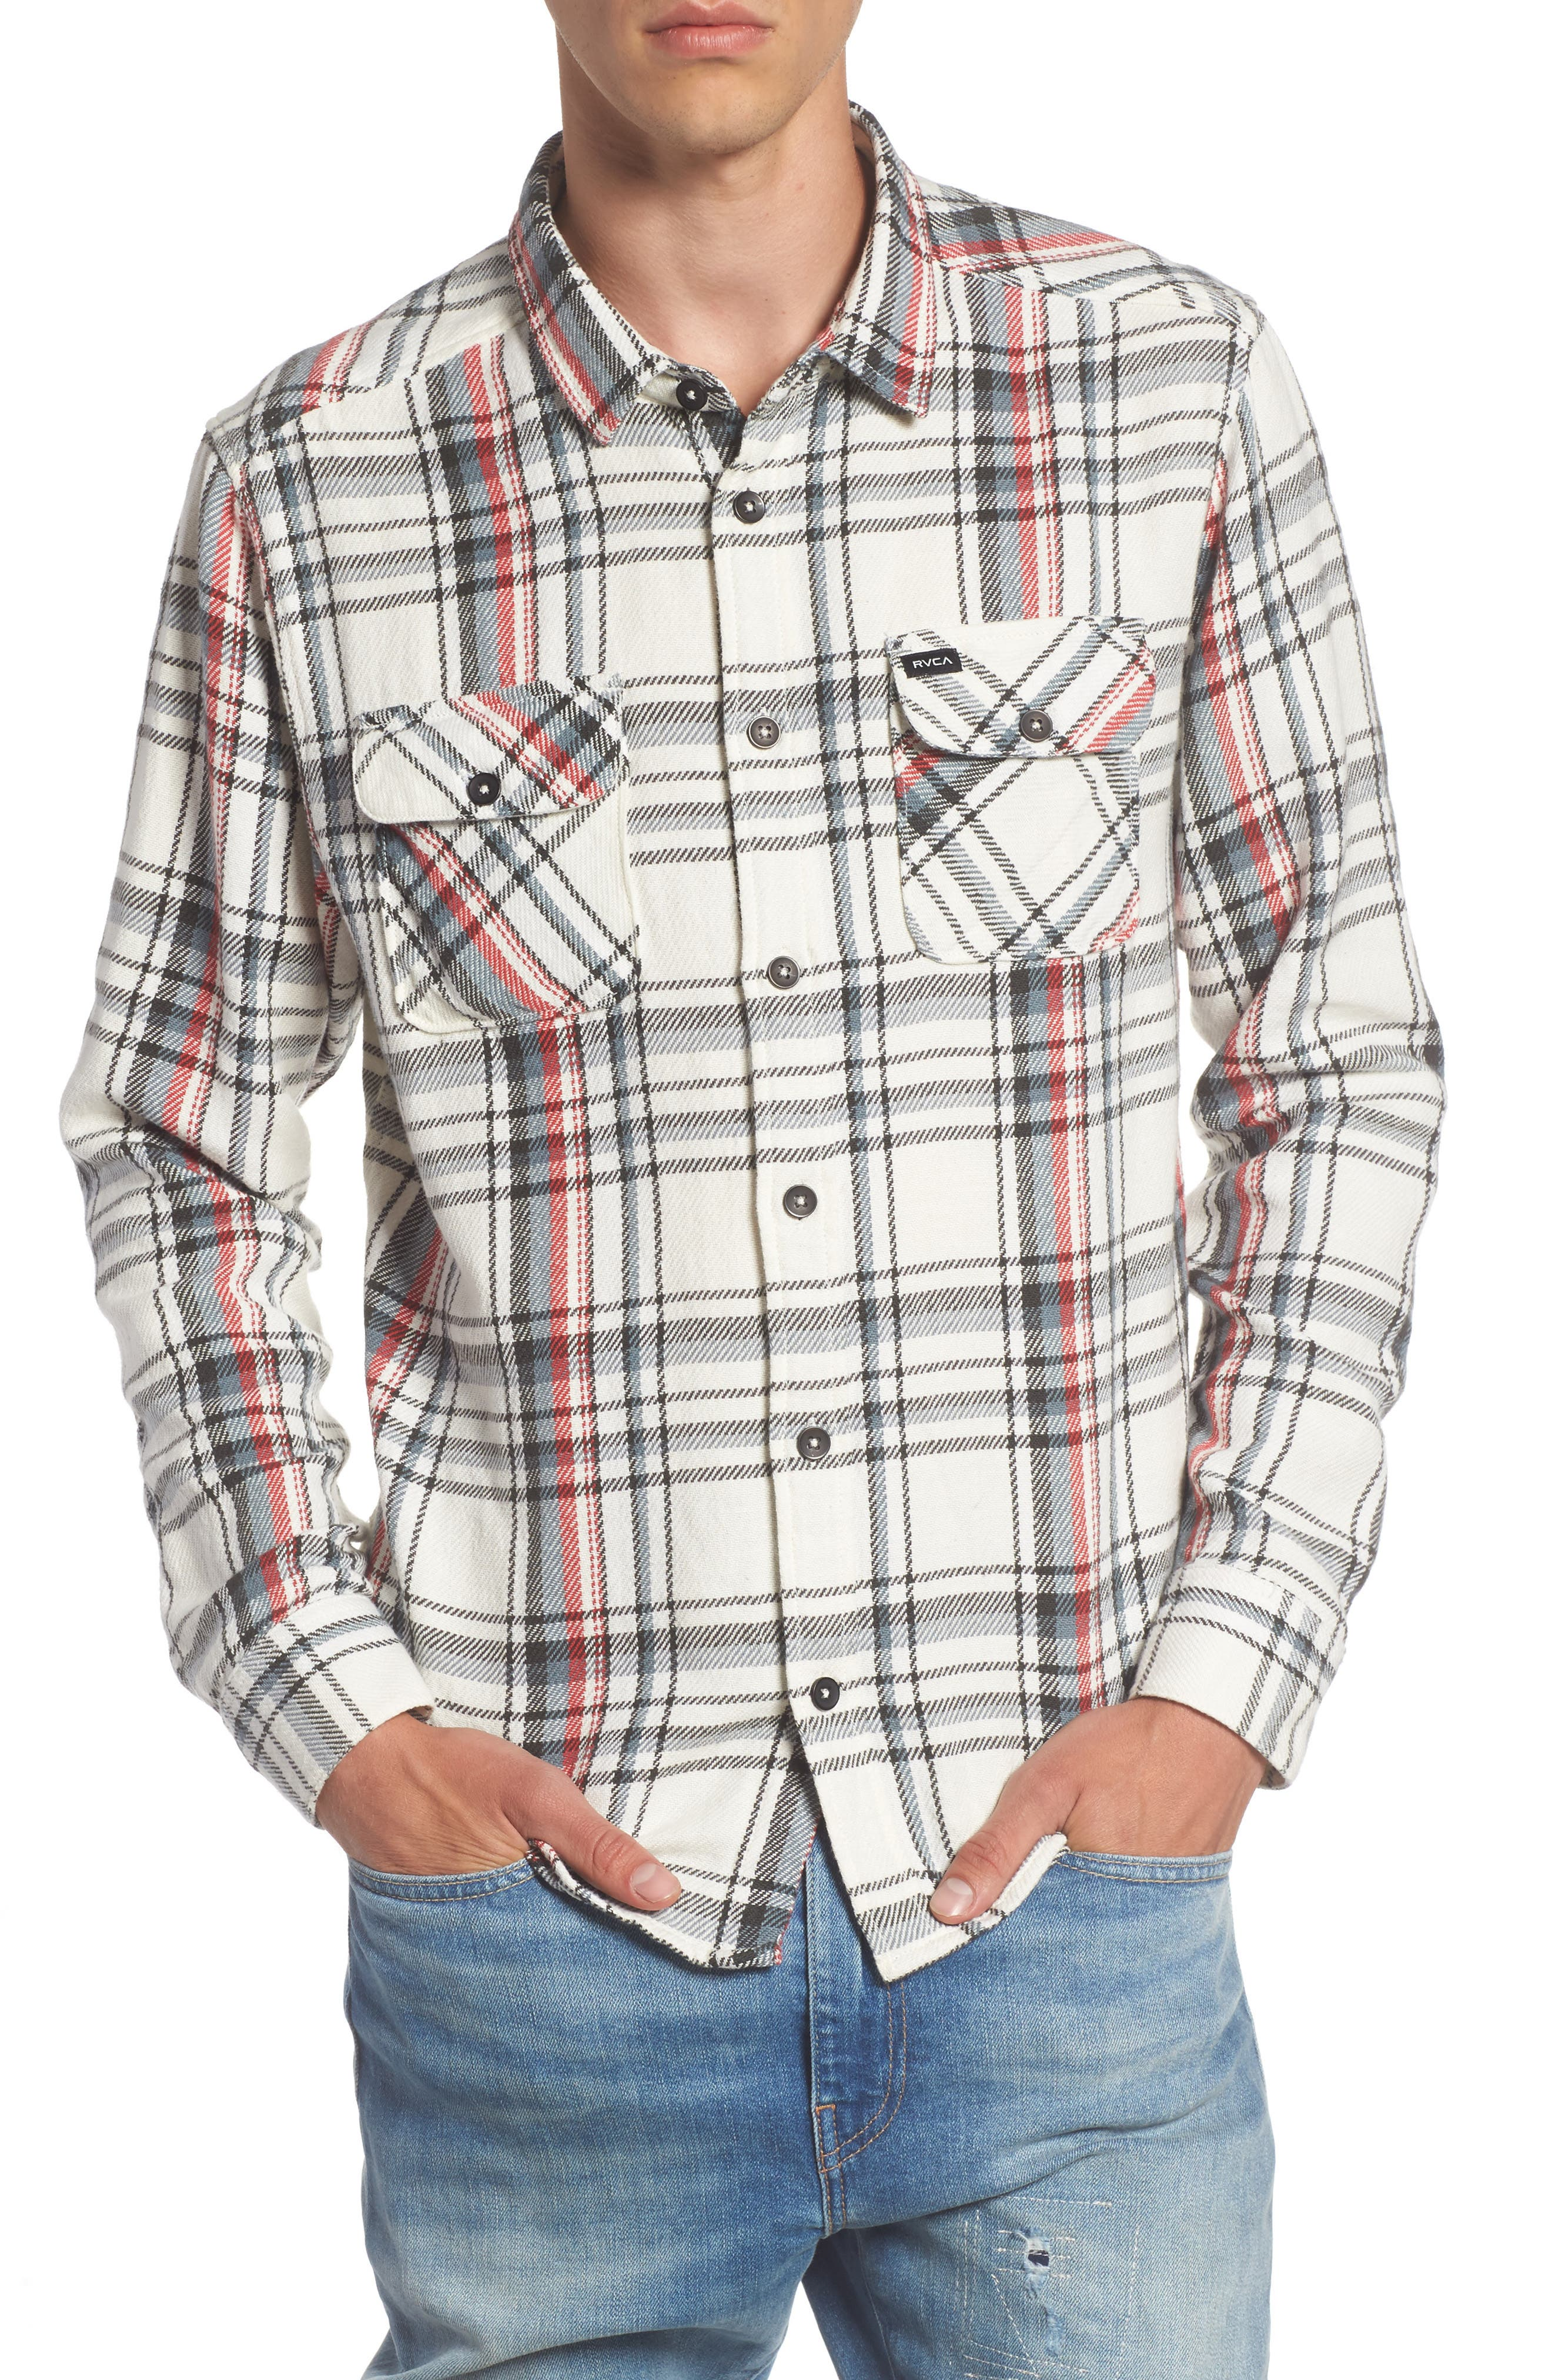 Main Image - RVCA Camino Plaid Flannel Shirt